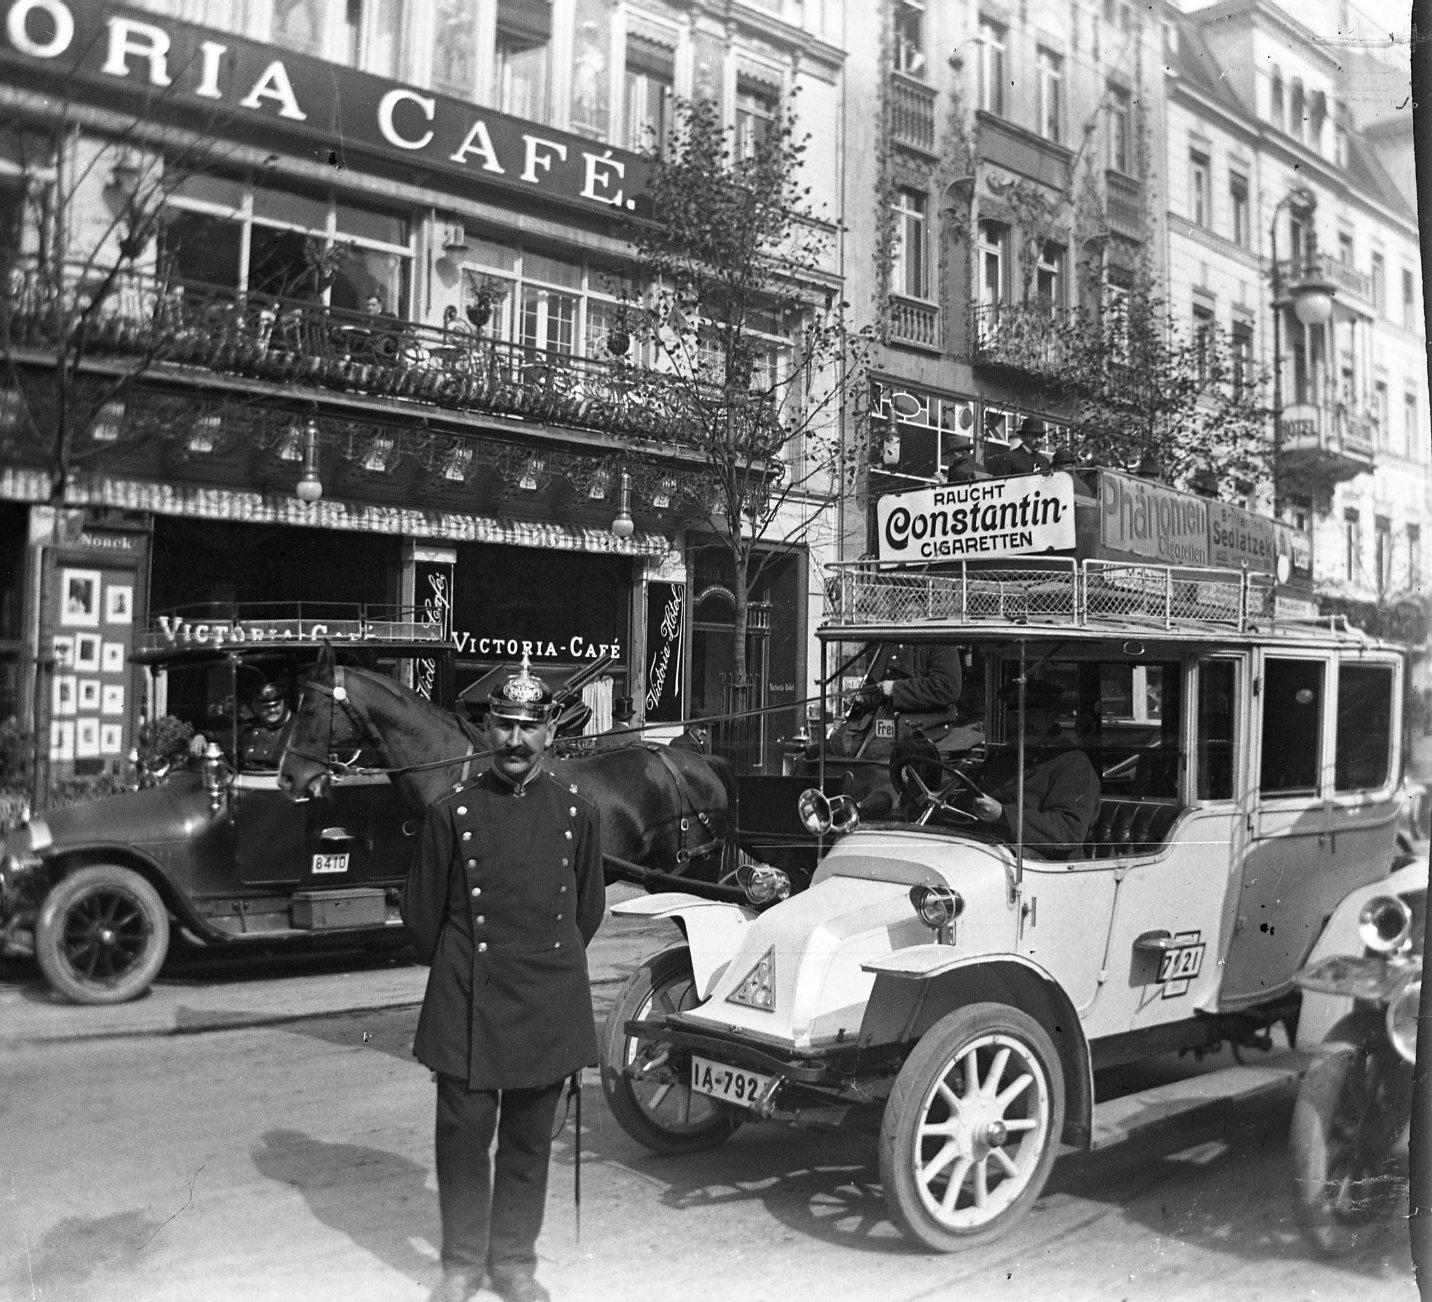 1912 – Series 5 – 04 – Victoria Cafe